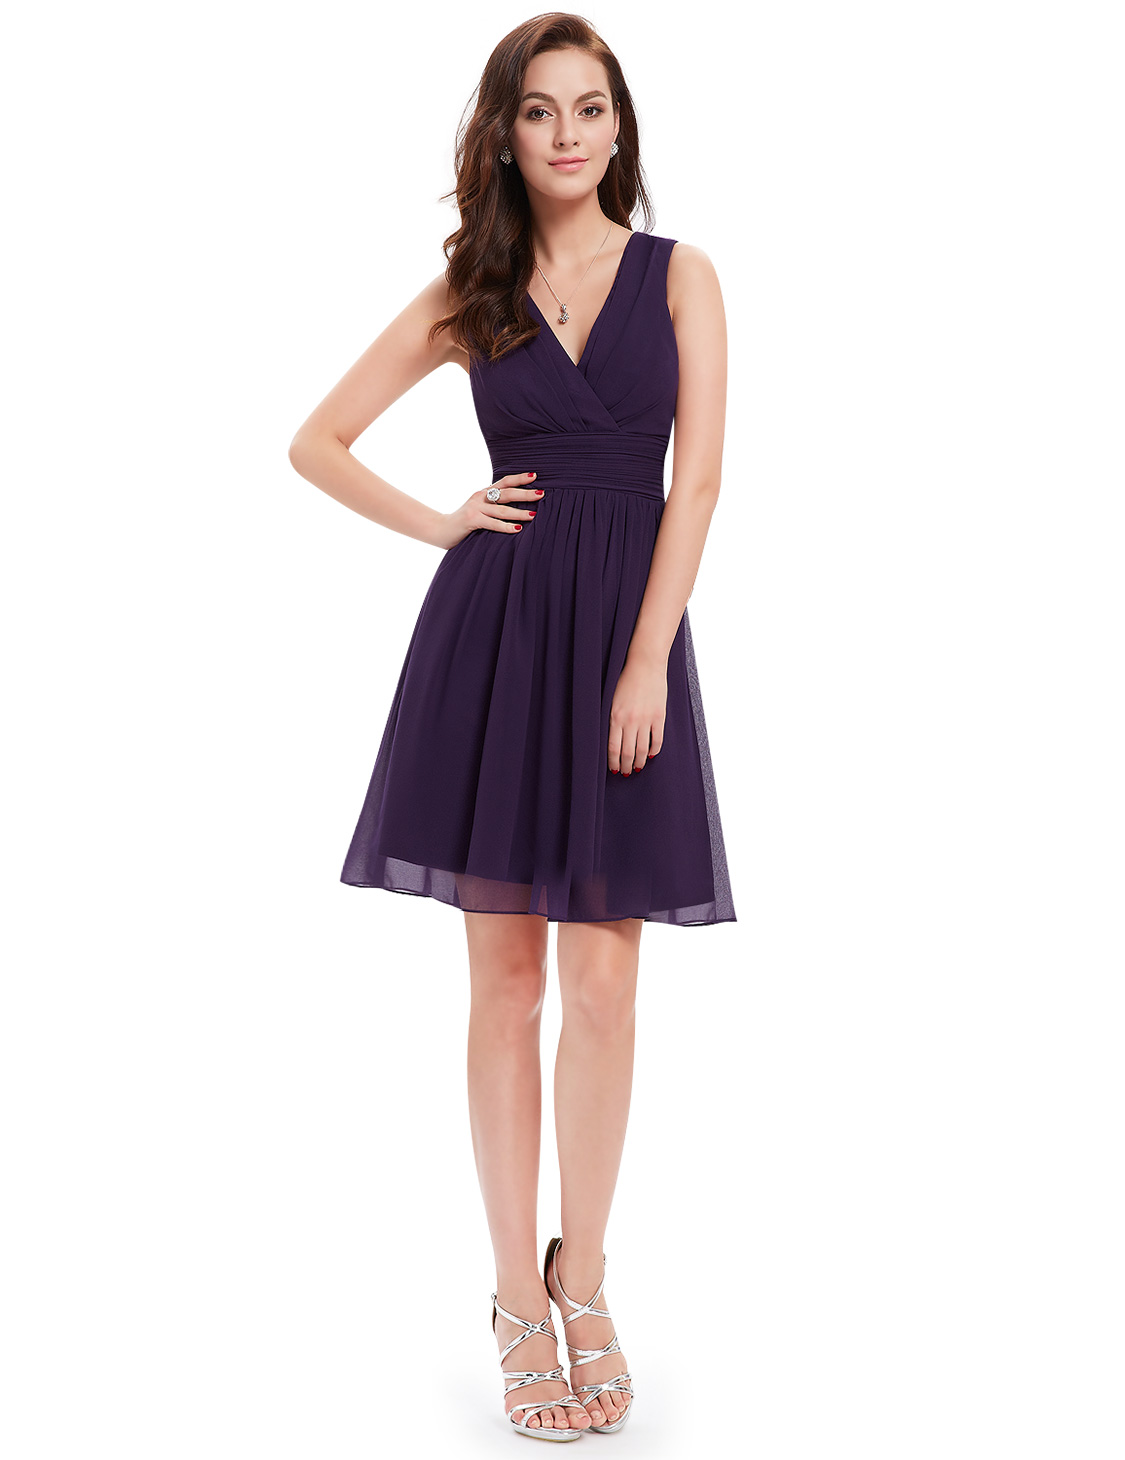 US Short Chiffon Homecoming Dress Bridesmaid Prom Dress Formal Evening 03989 | EBay